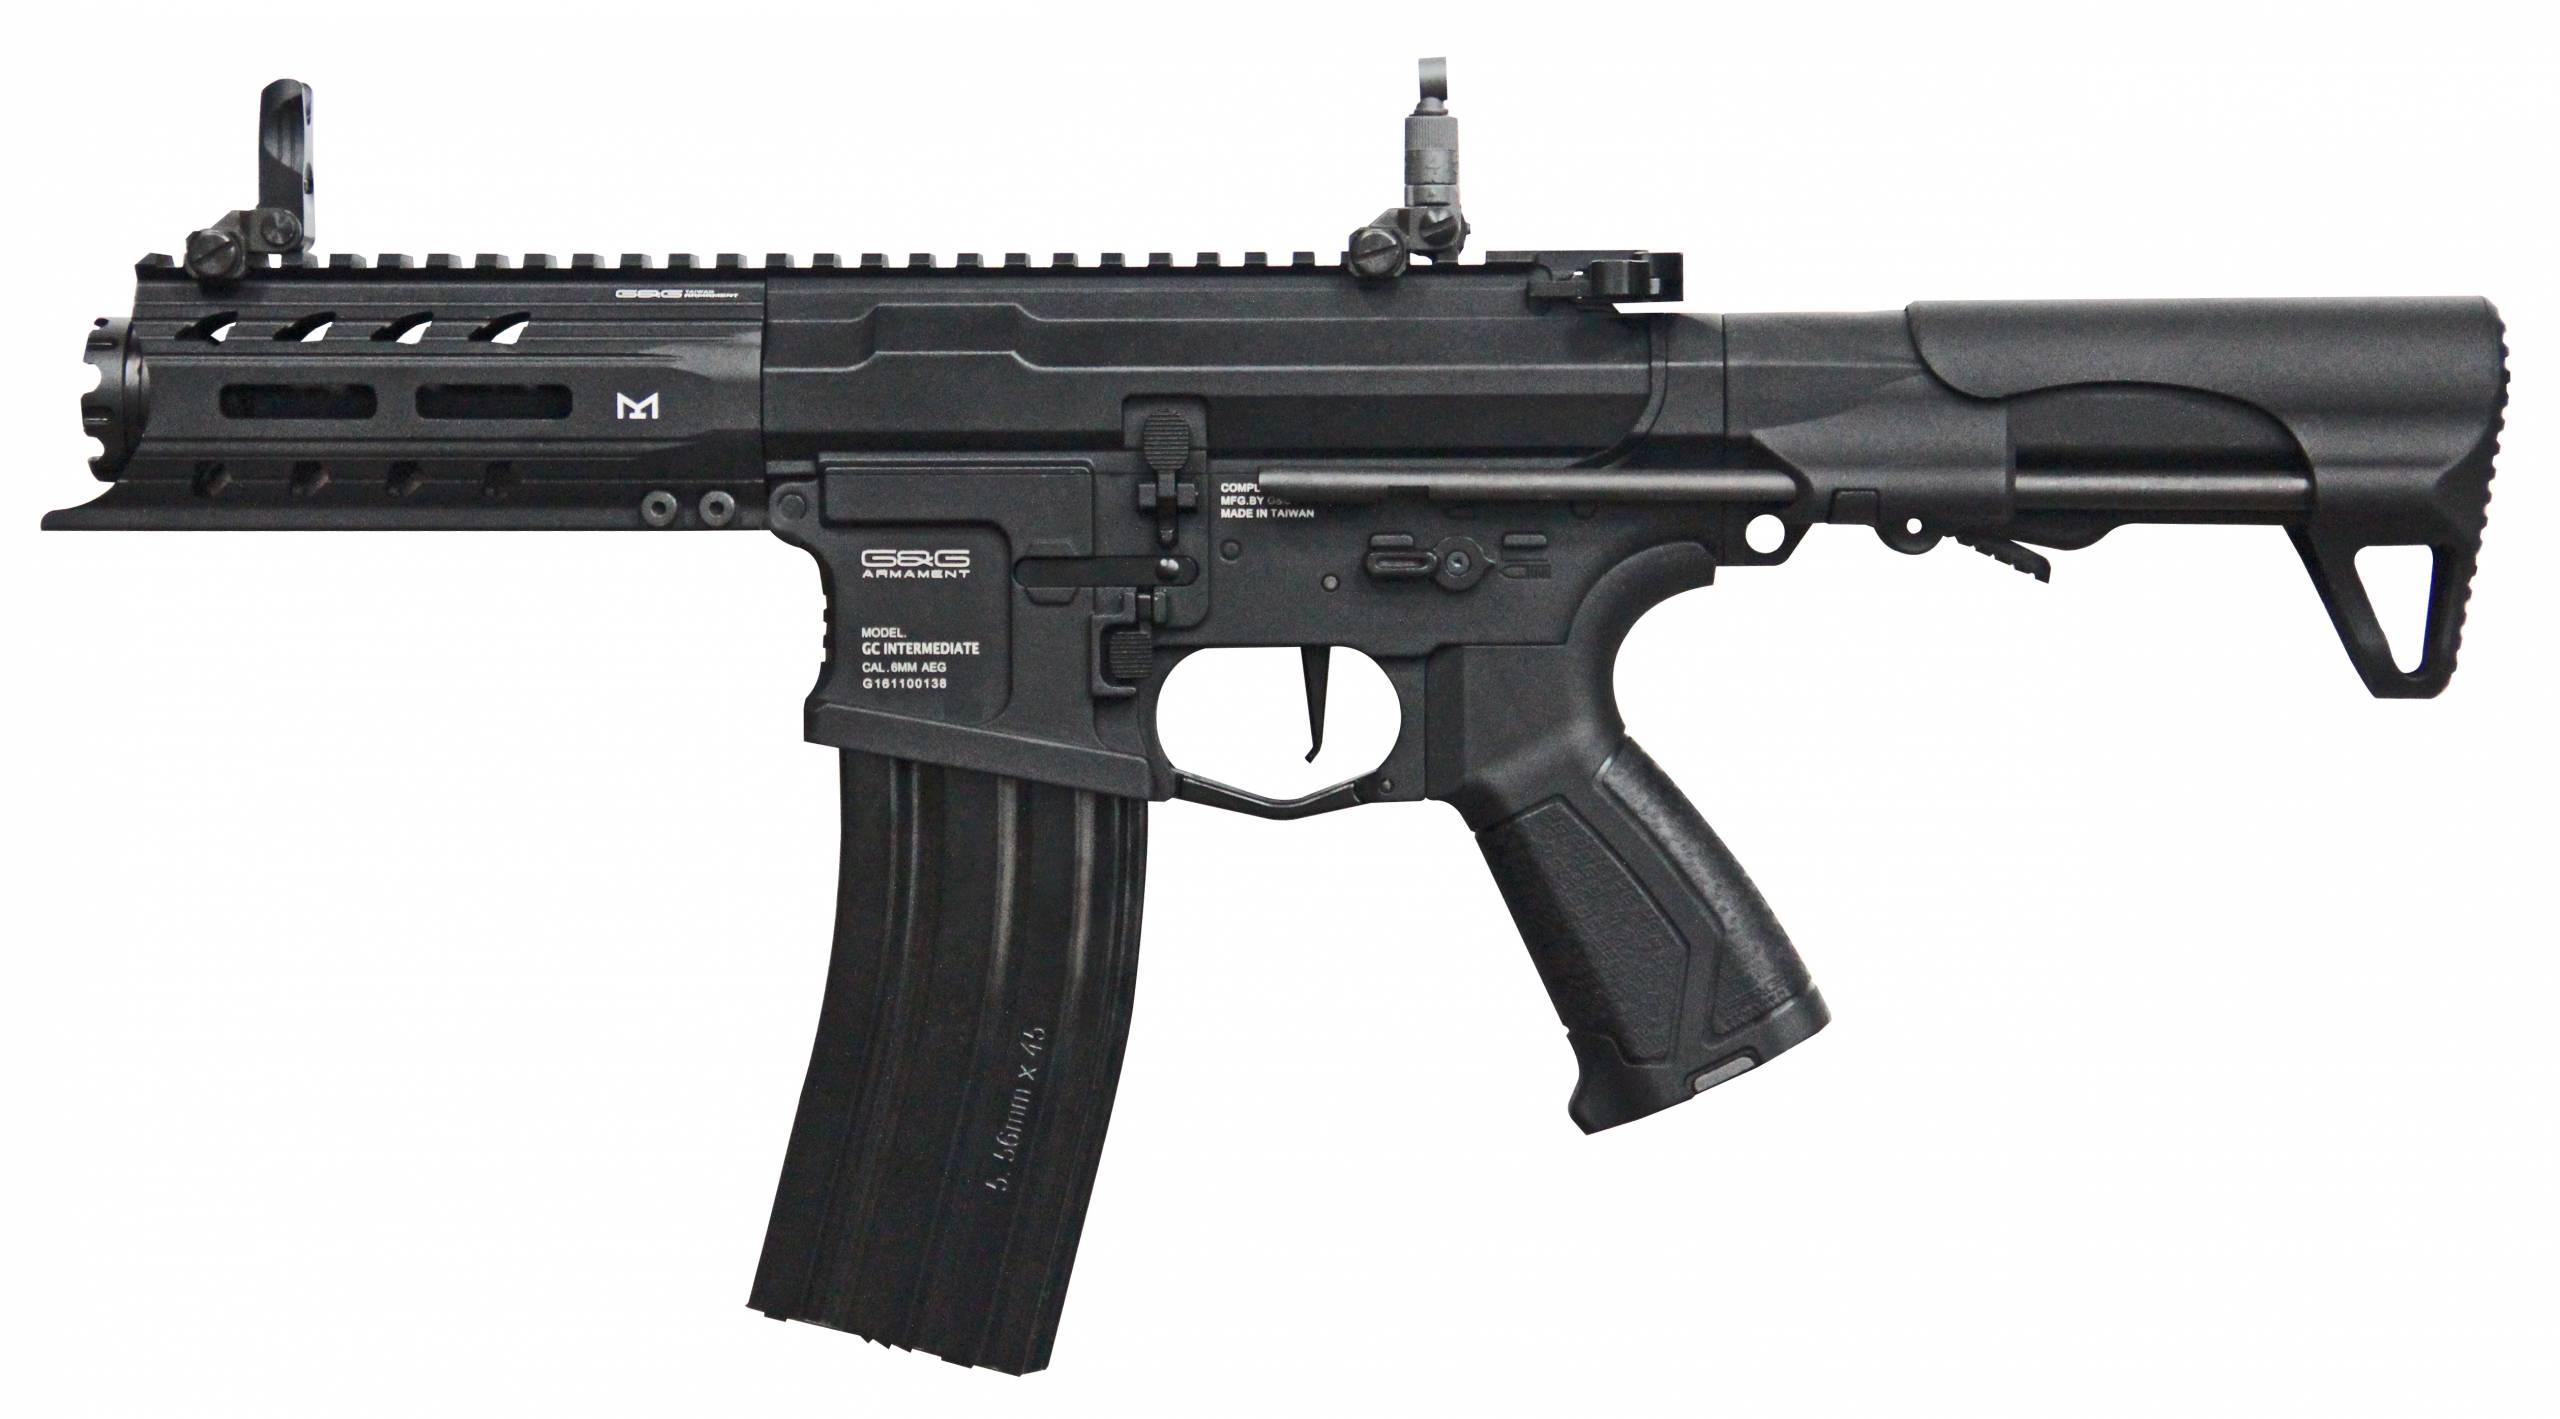 G&G ARP 556 product image